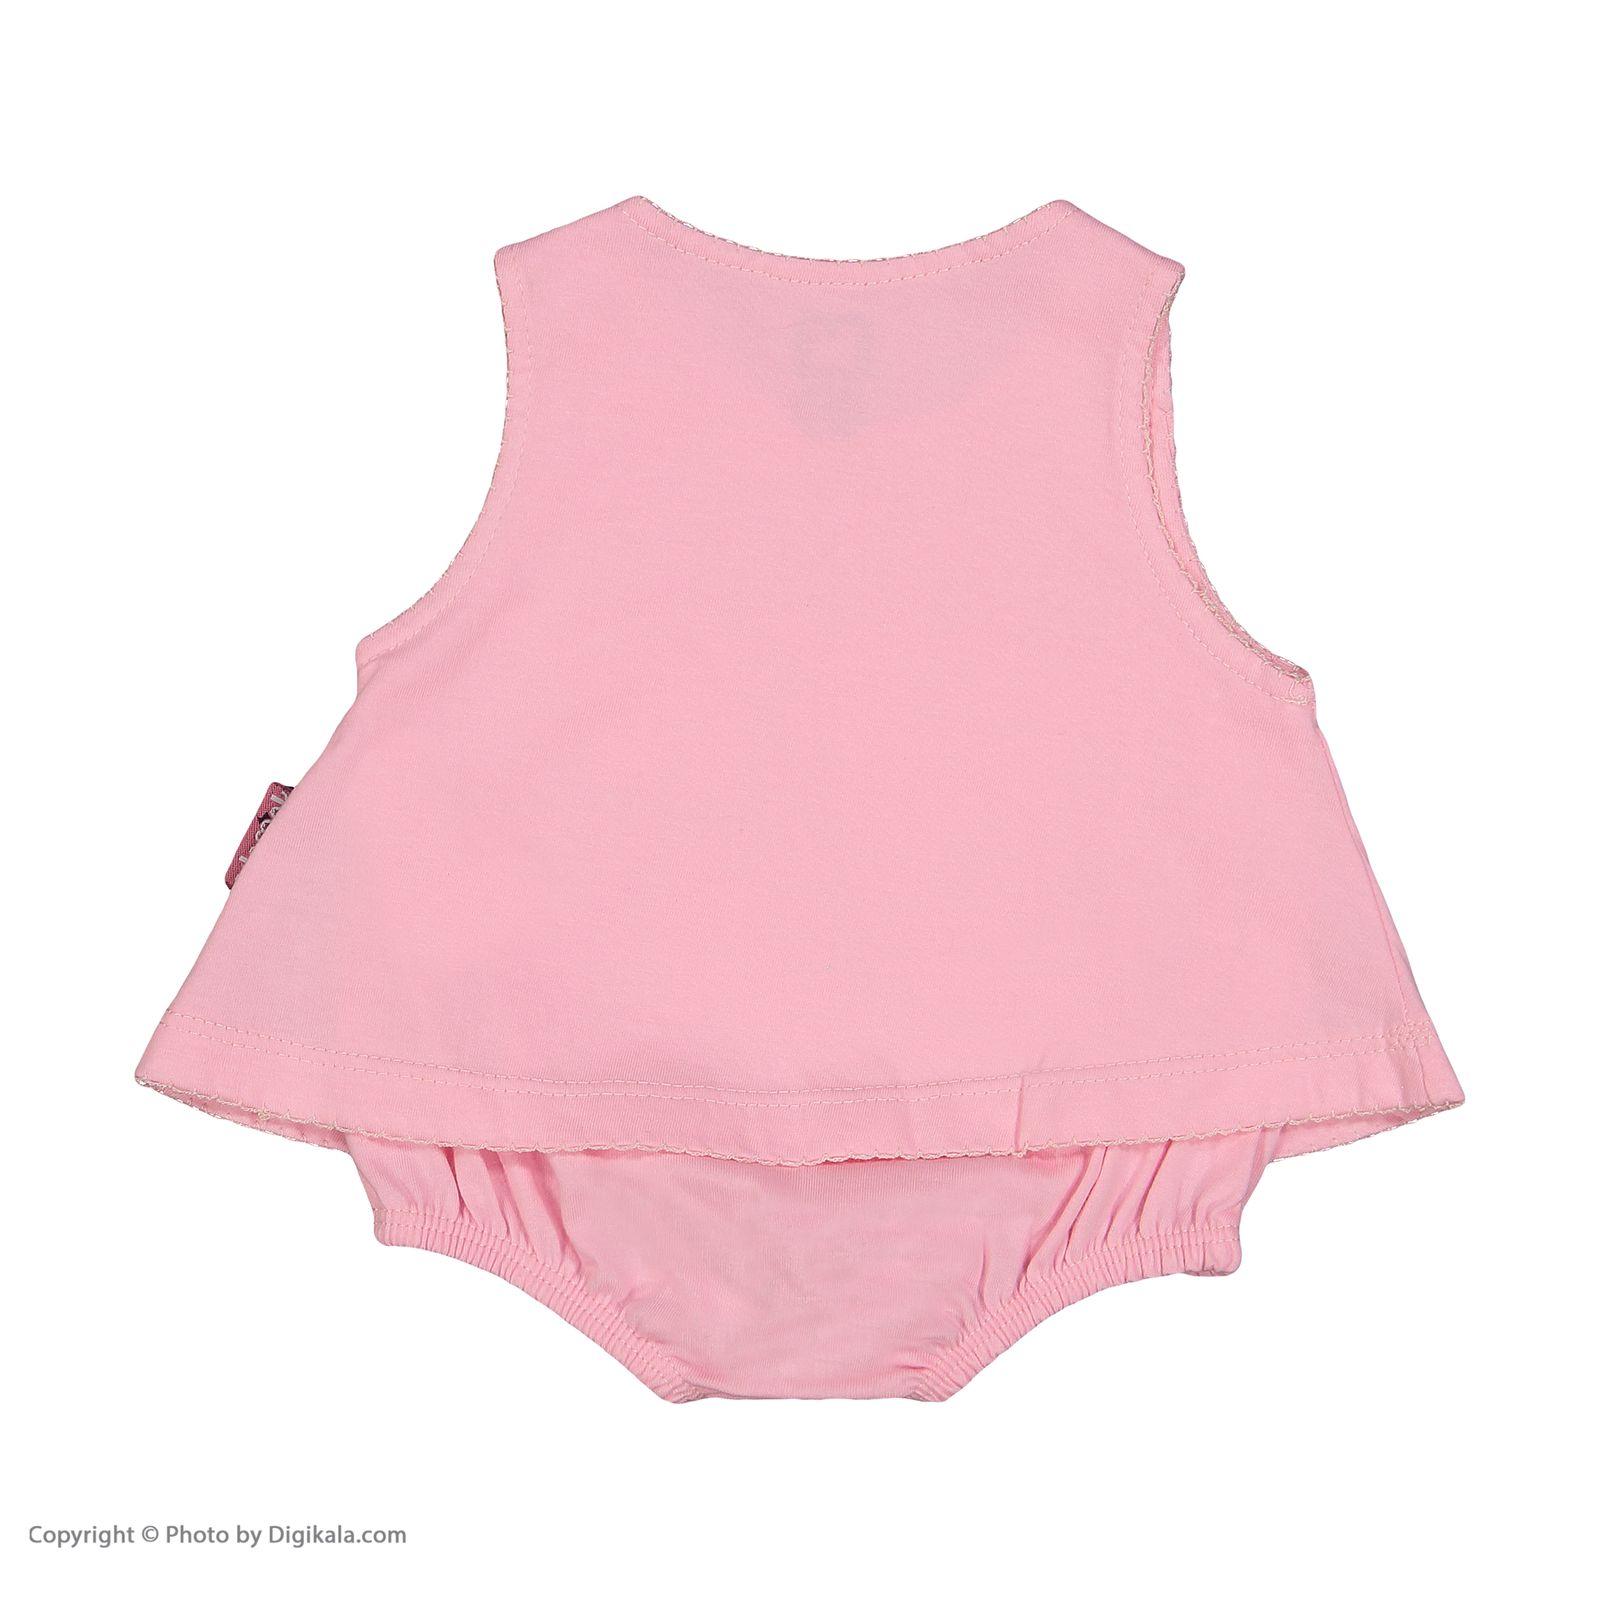 سرهمی نوزادی دخترانه آدمک مدل 2171108-84 -  - 4